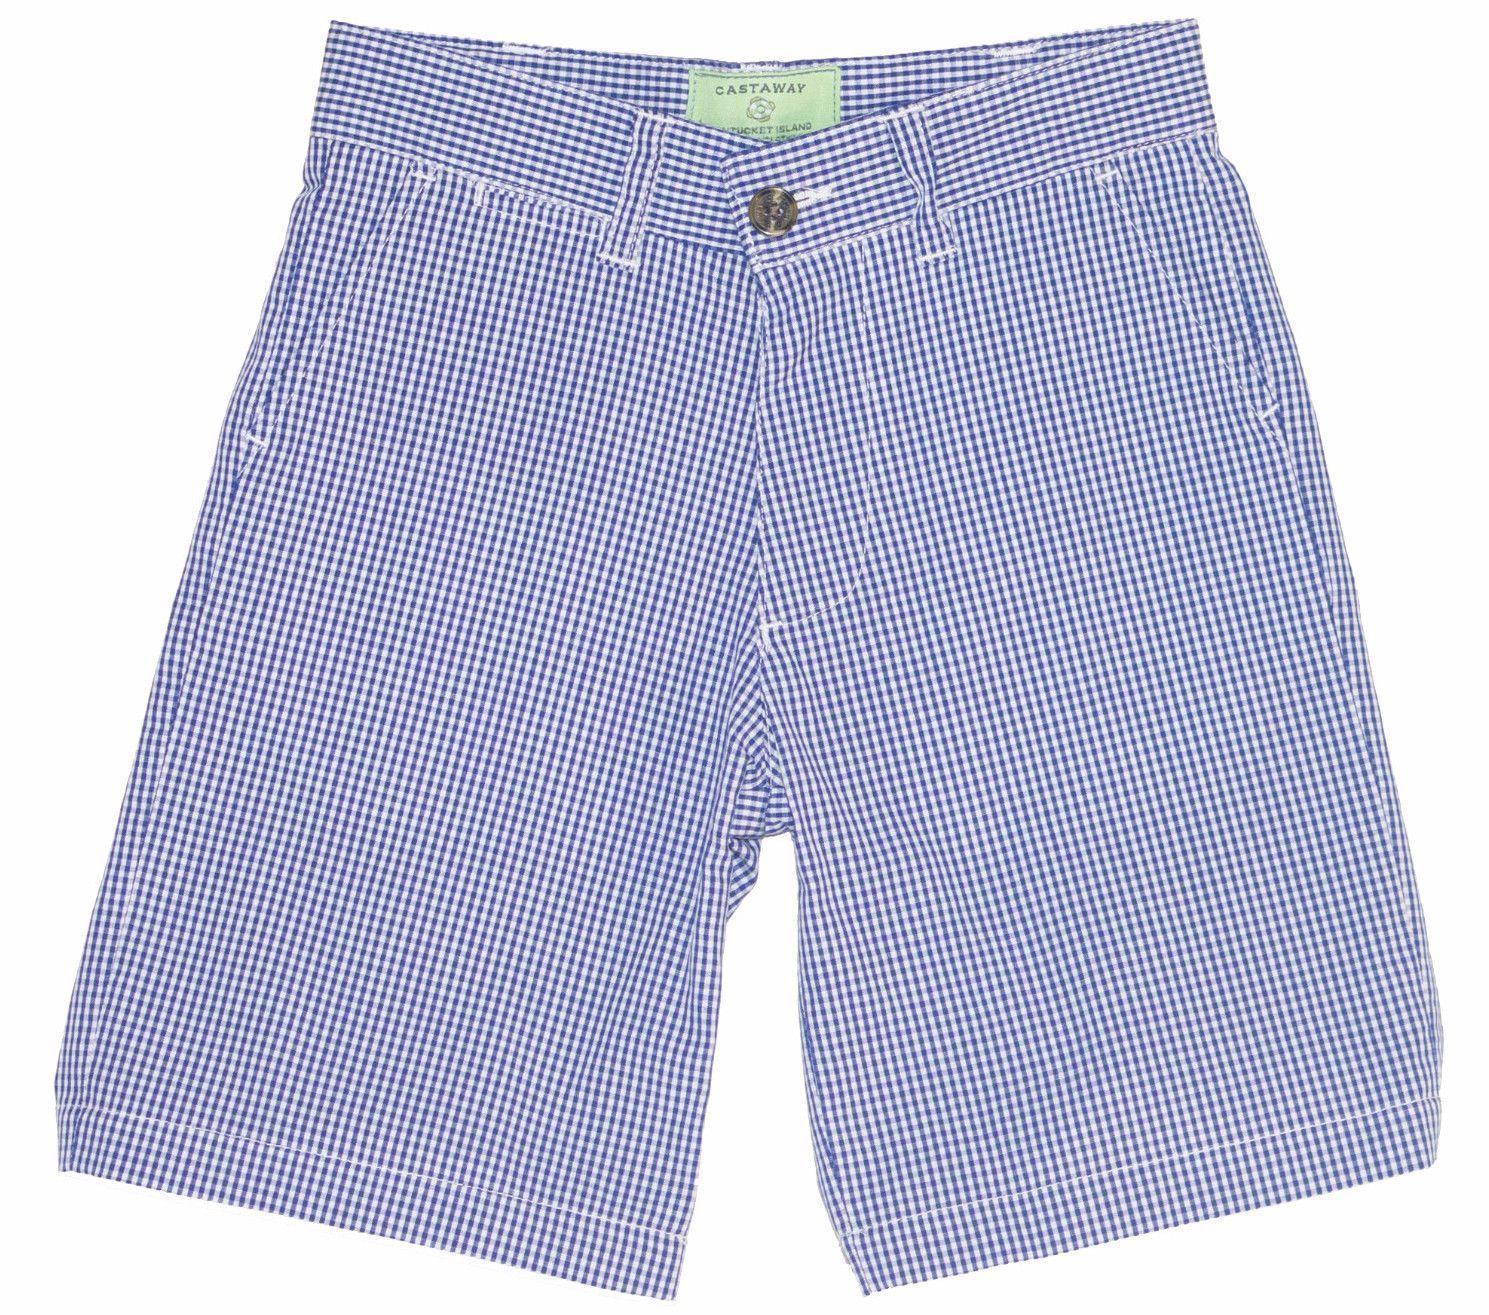 Jetties Shorts Micro Gingham Royal